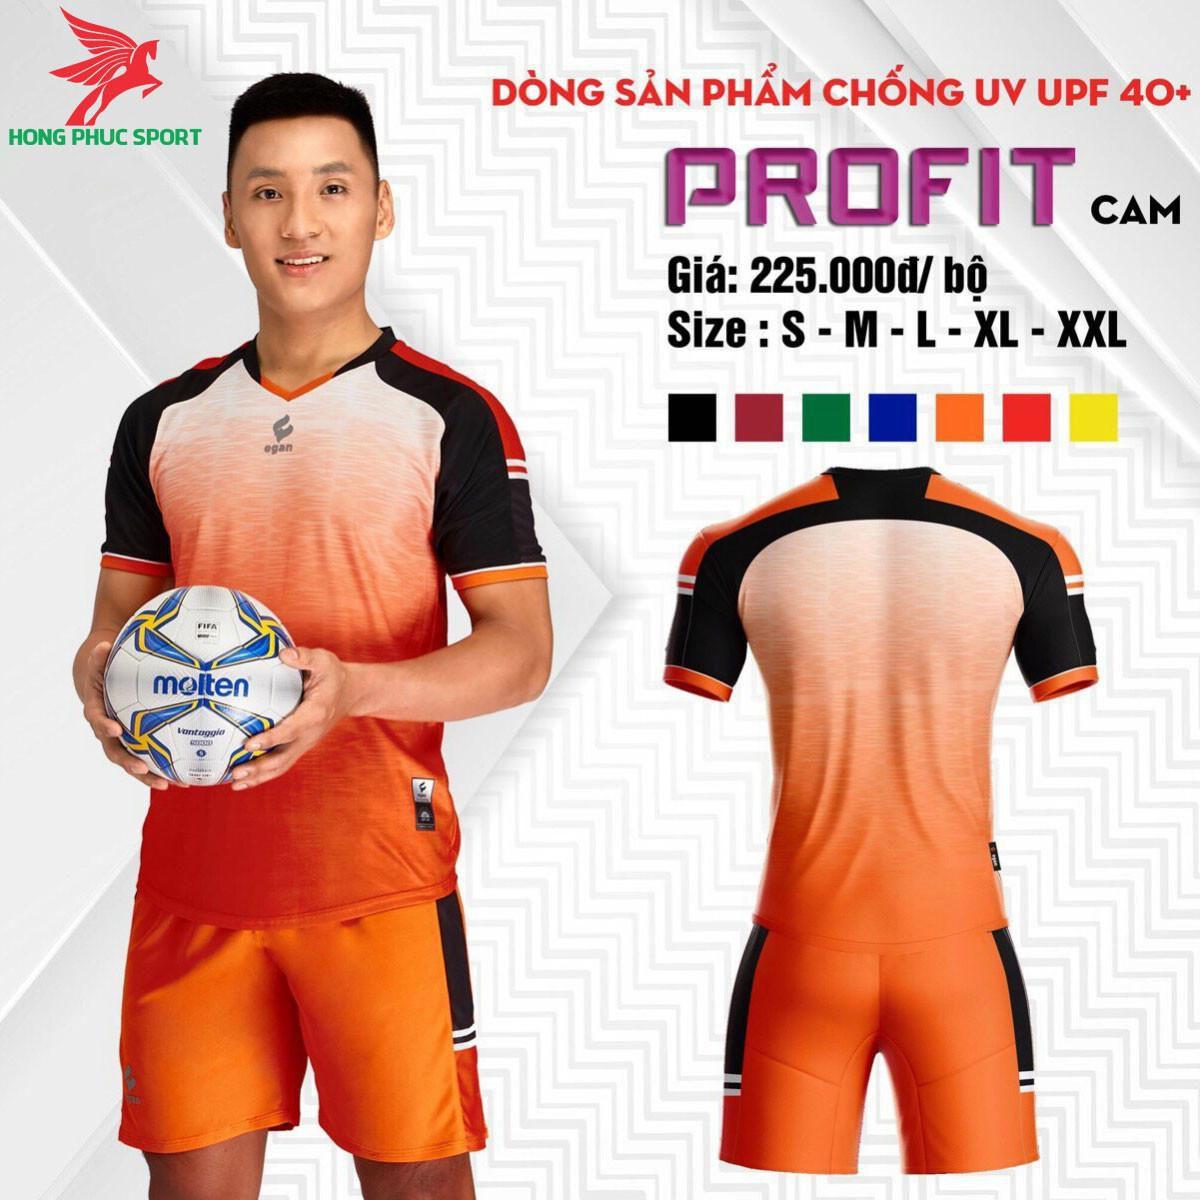 https://cdn.hongphucsport.com/unsafe/s4.shopbay.vn/files/285/ao-da-bong-khong-logo-egan-profit-mau-cam-60506355a6efc.jpg